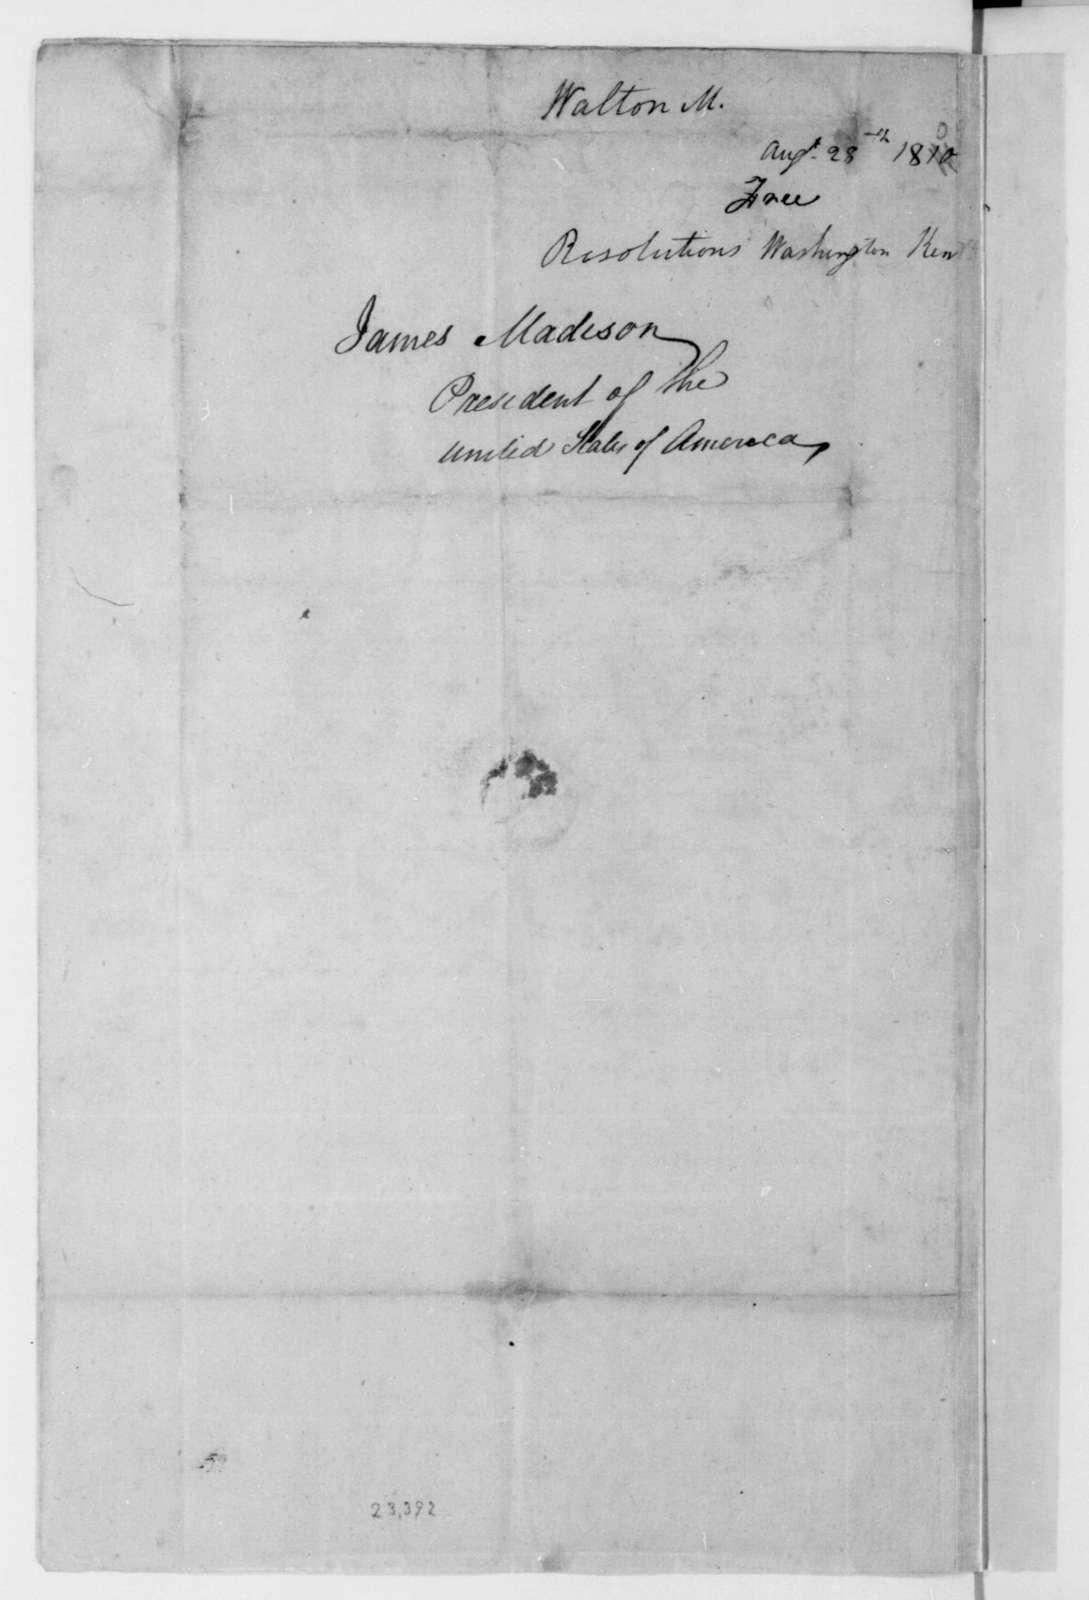 Mathew Walton - Washington County Kentucky Citizen to James Madison, August 28, 1809. Address and resolutions.